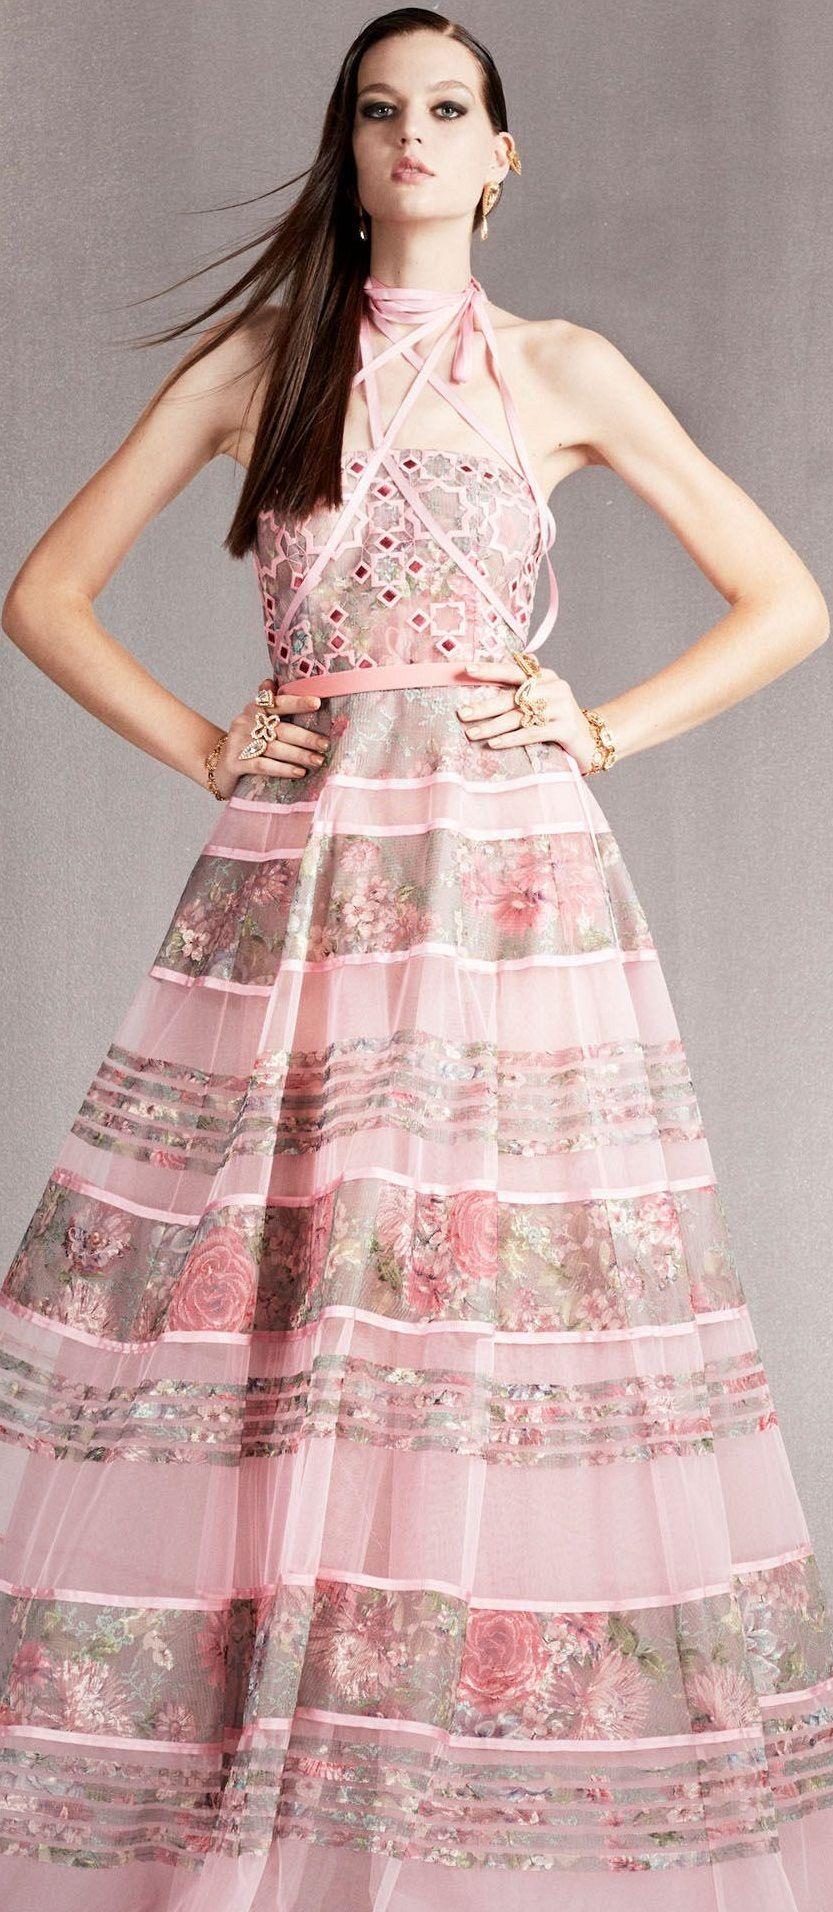 Georges Hobeika Spring \'18. | Look at that Dress! | Pinterest ...